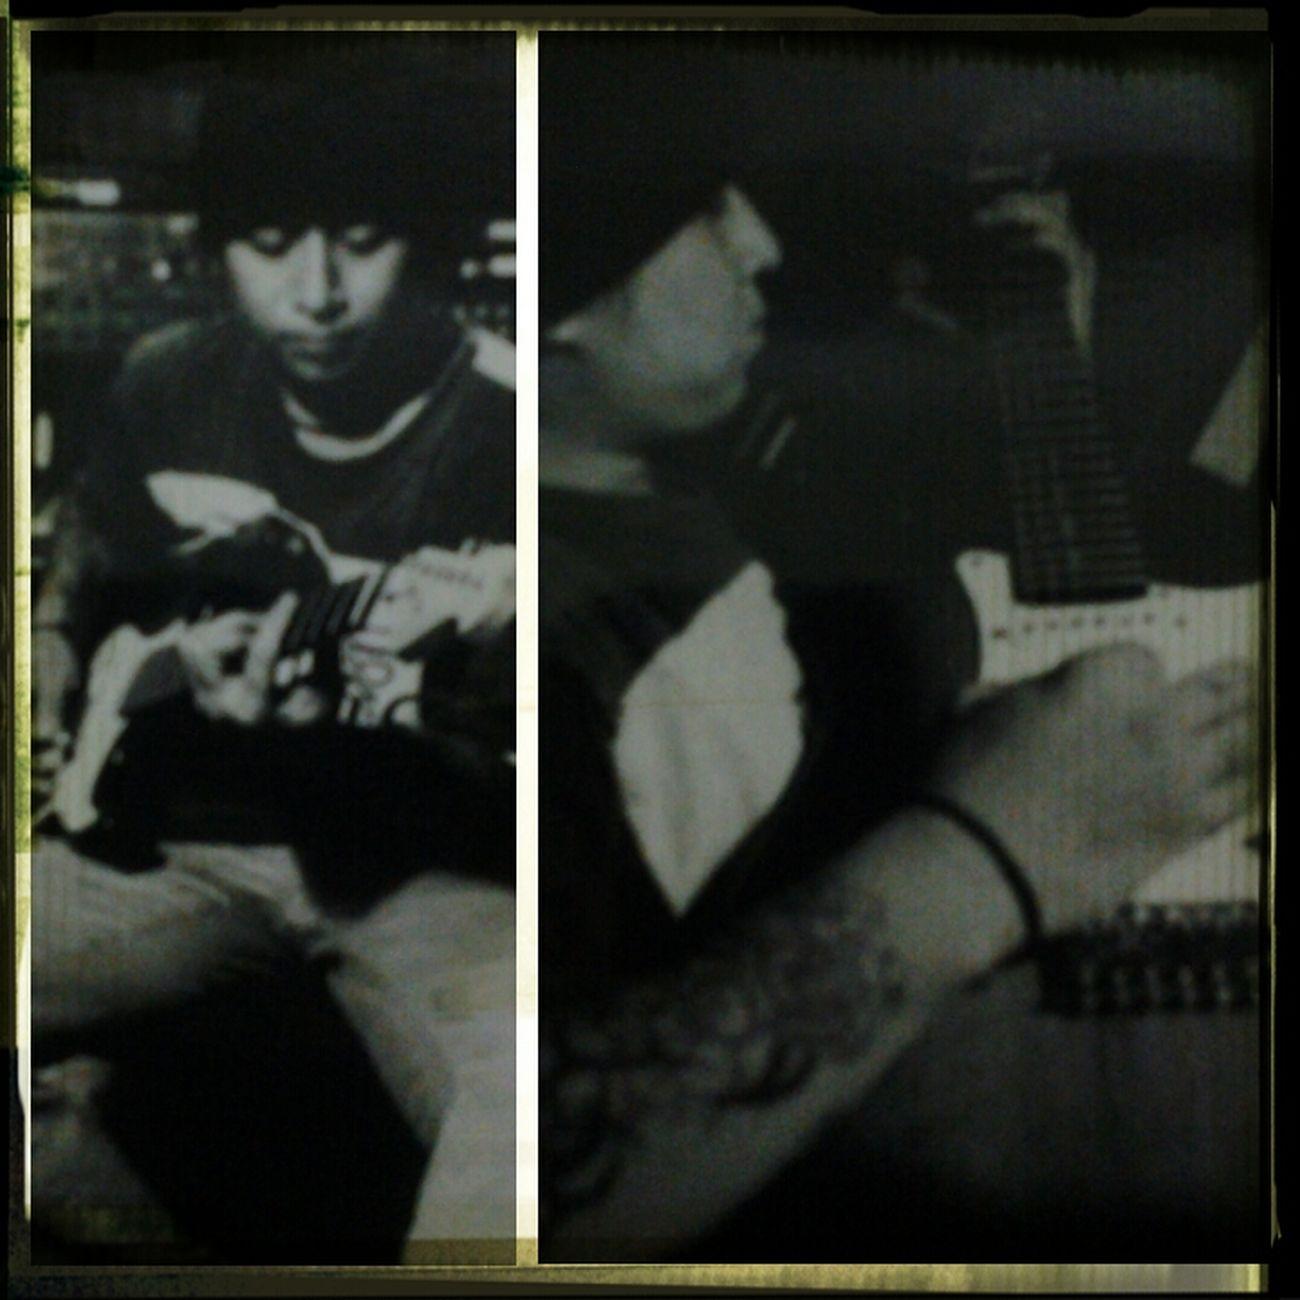 Rayrhee Leadguitar Jetcoasterskaband Pondokgede_indonesia ...cool...